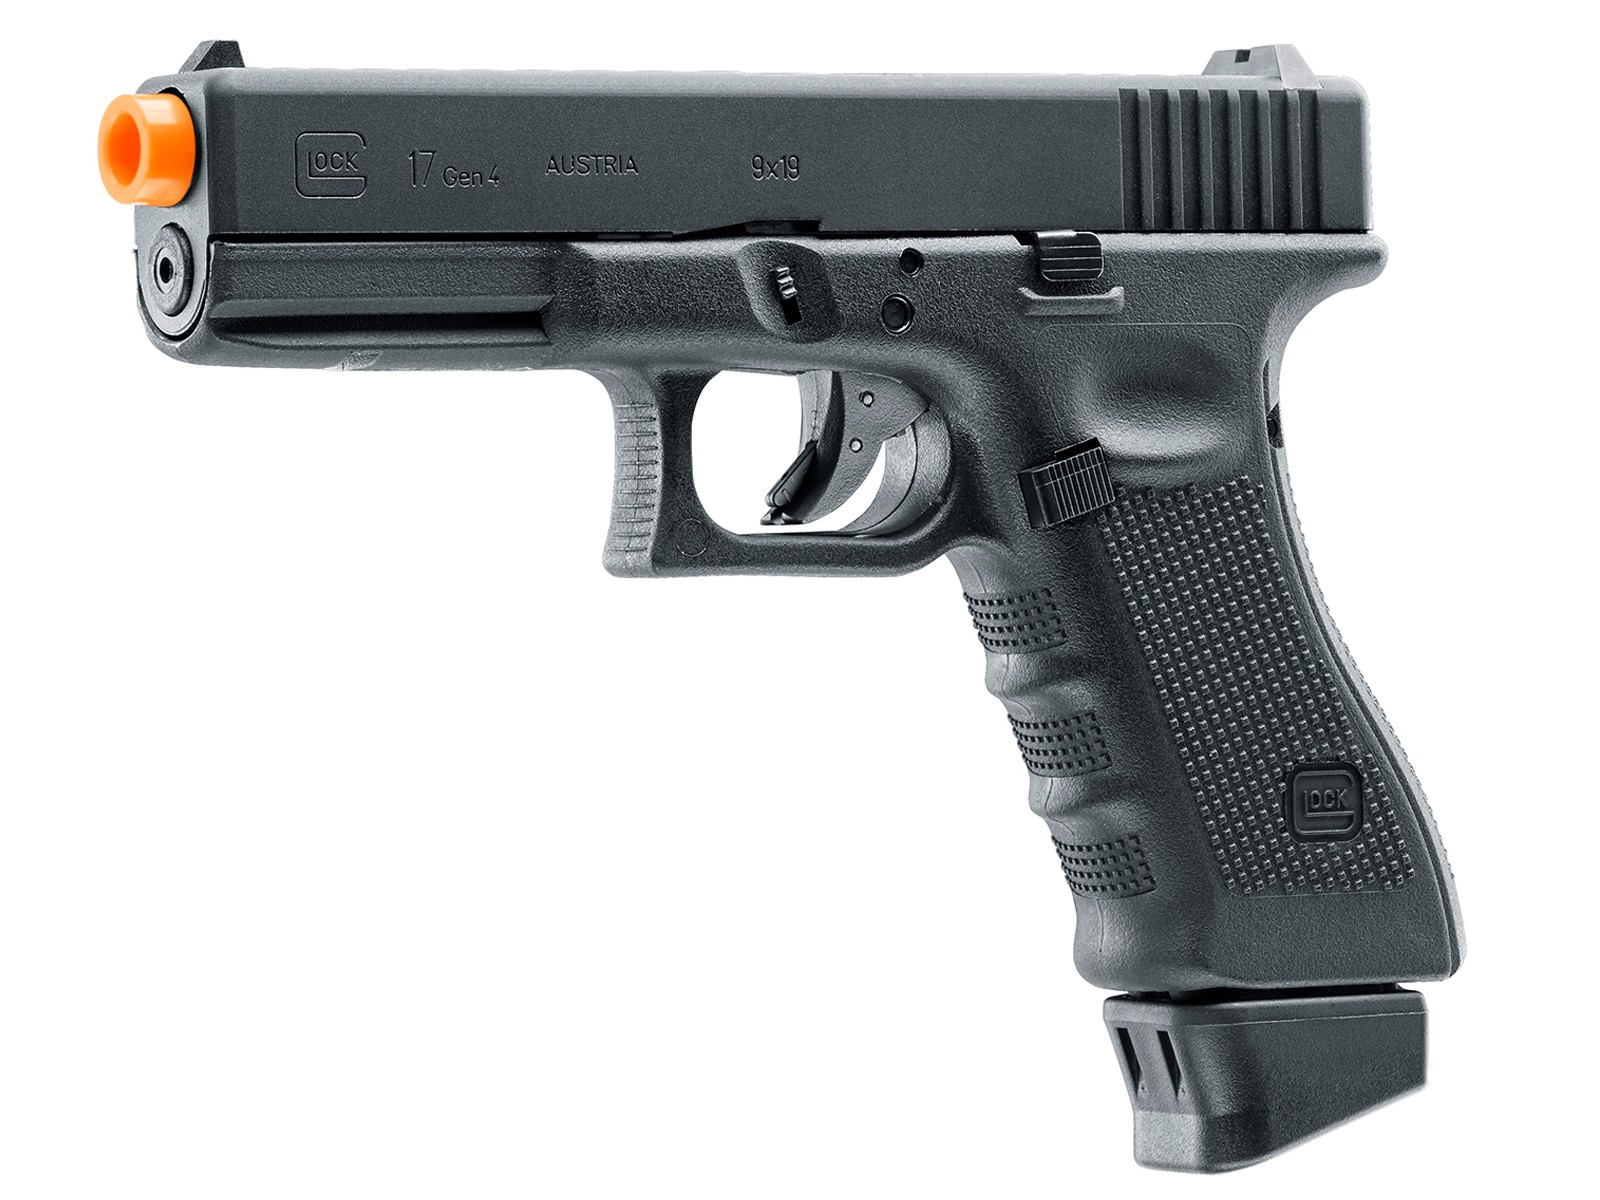 Glock_G17_Gen4_CO2_Blowback_Airsoft_Pistol_6mm